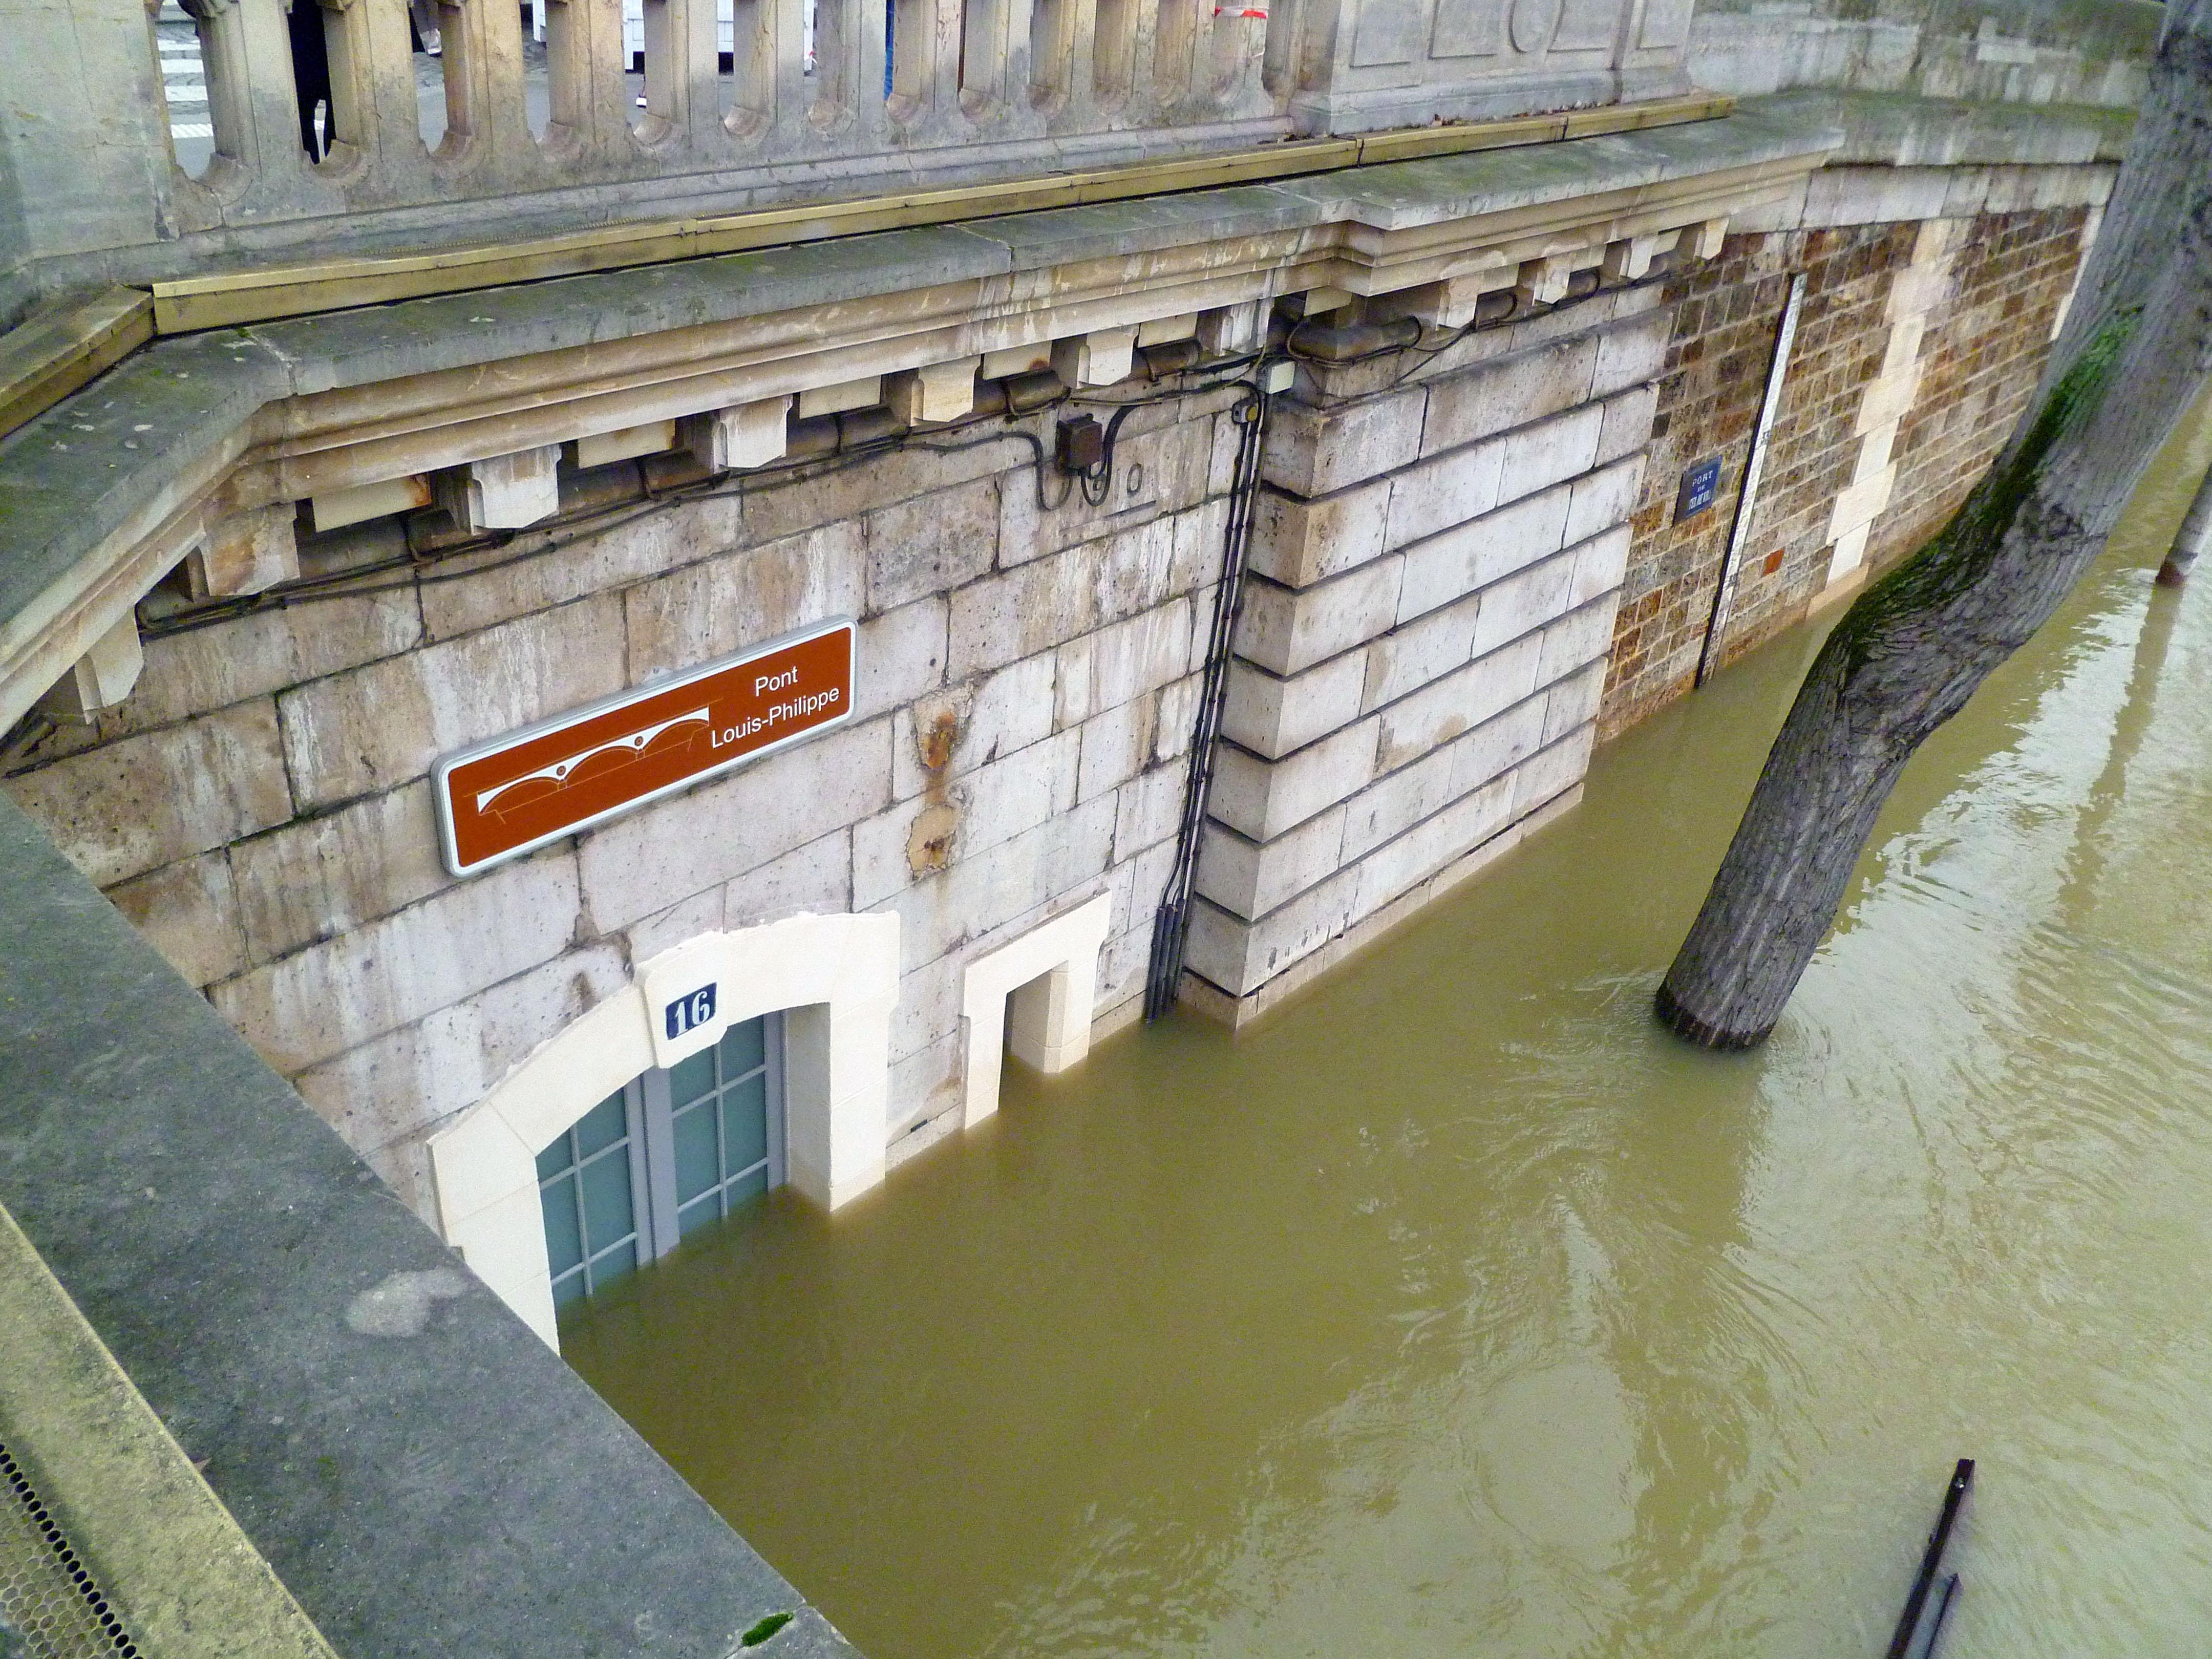 Paris - Crue de la Seine, 8 mars 2018